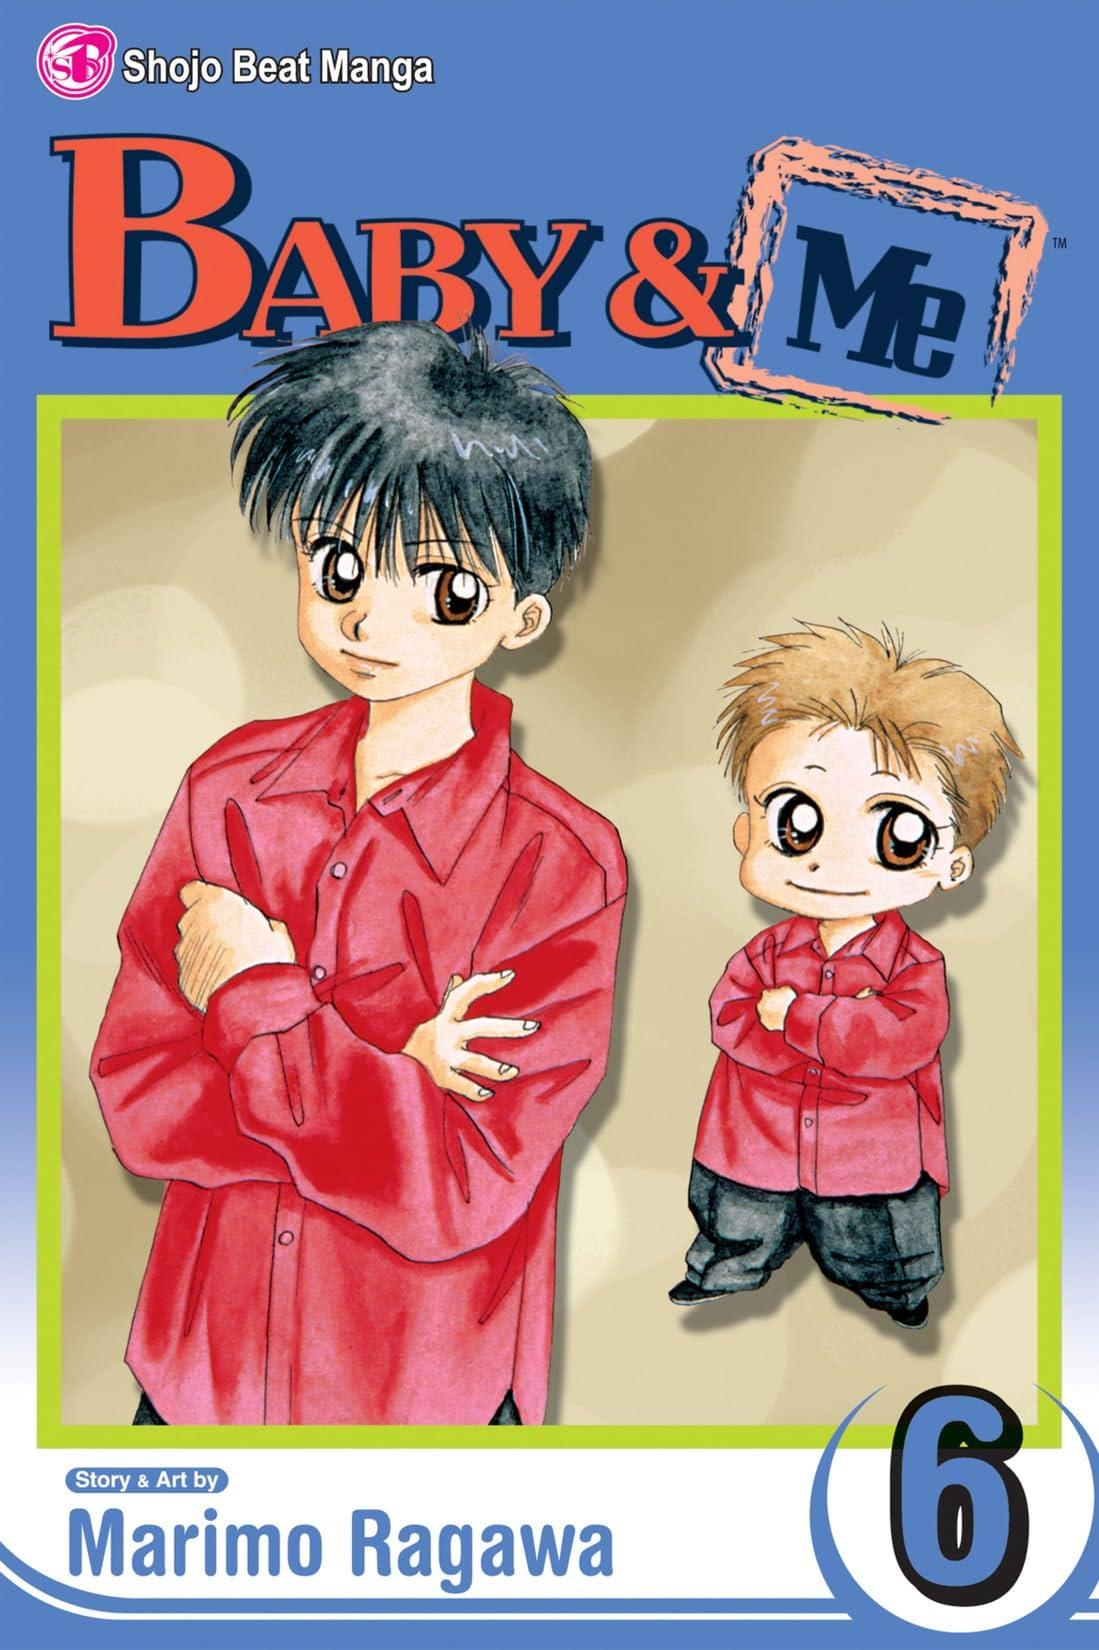 Baby & Me Vol. 6